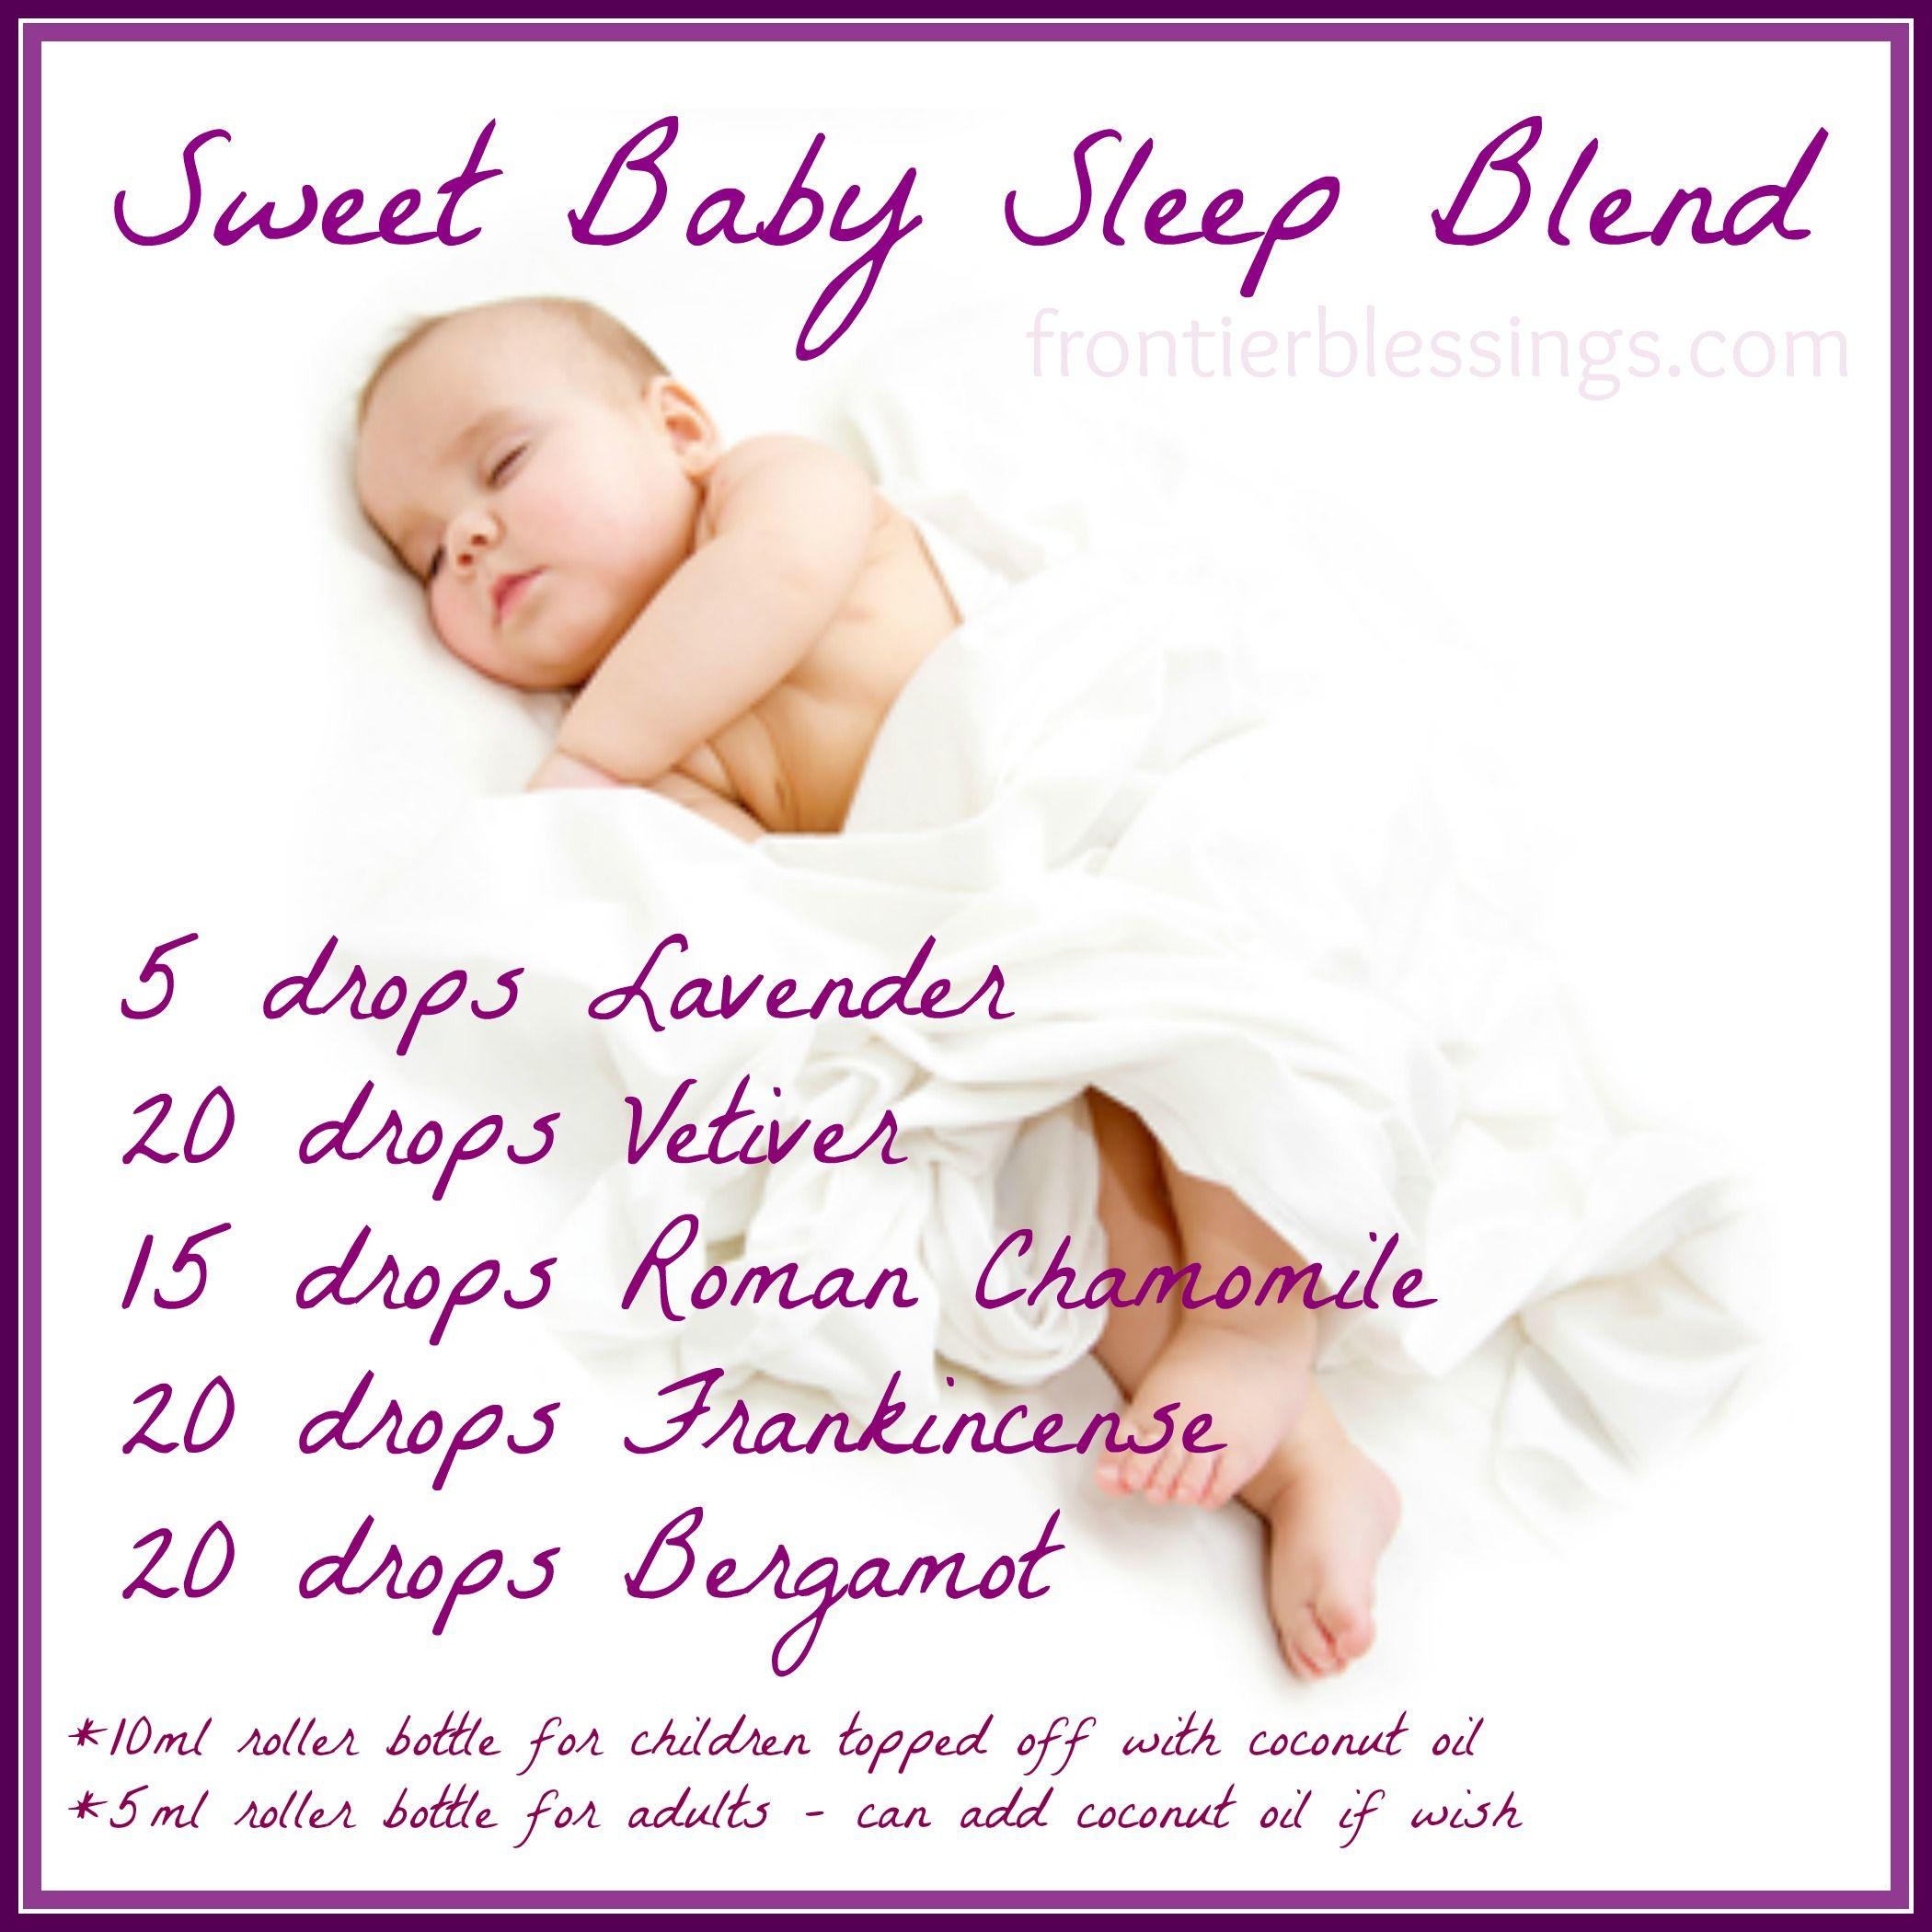 Sweet Baby Sleep Blend Jpg 2 100 215 2 100 Pixels Doterra